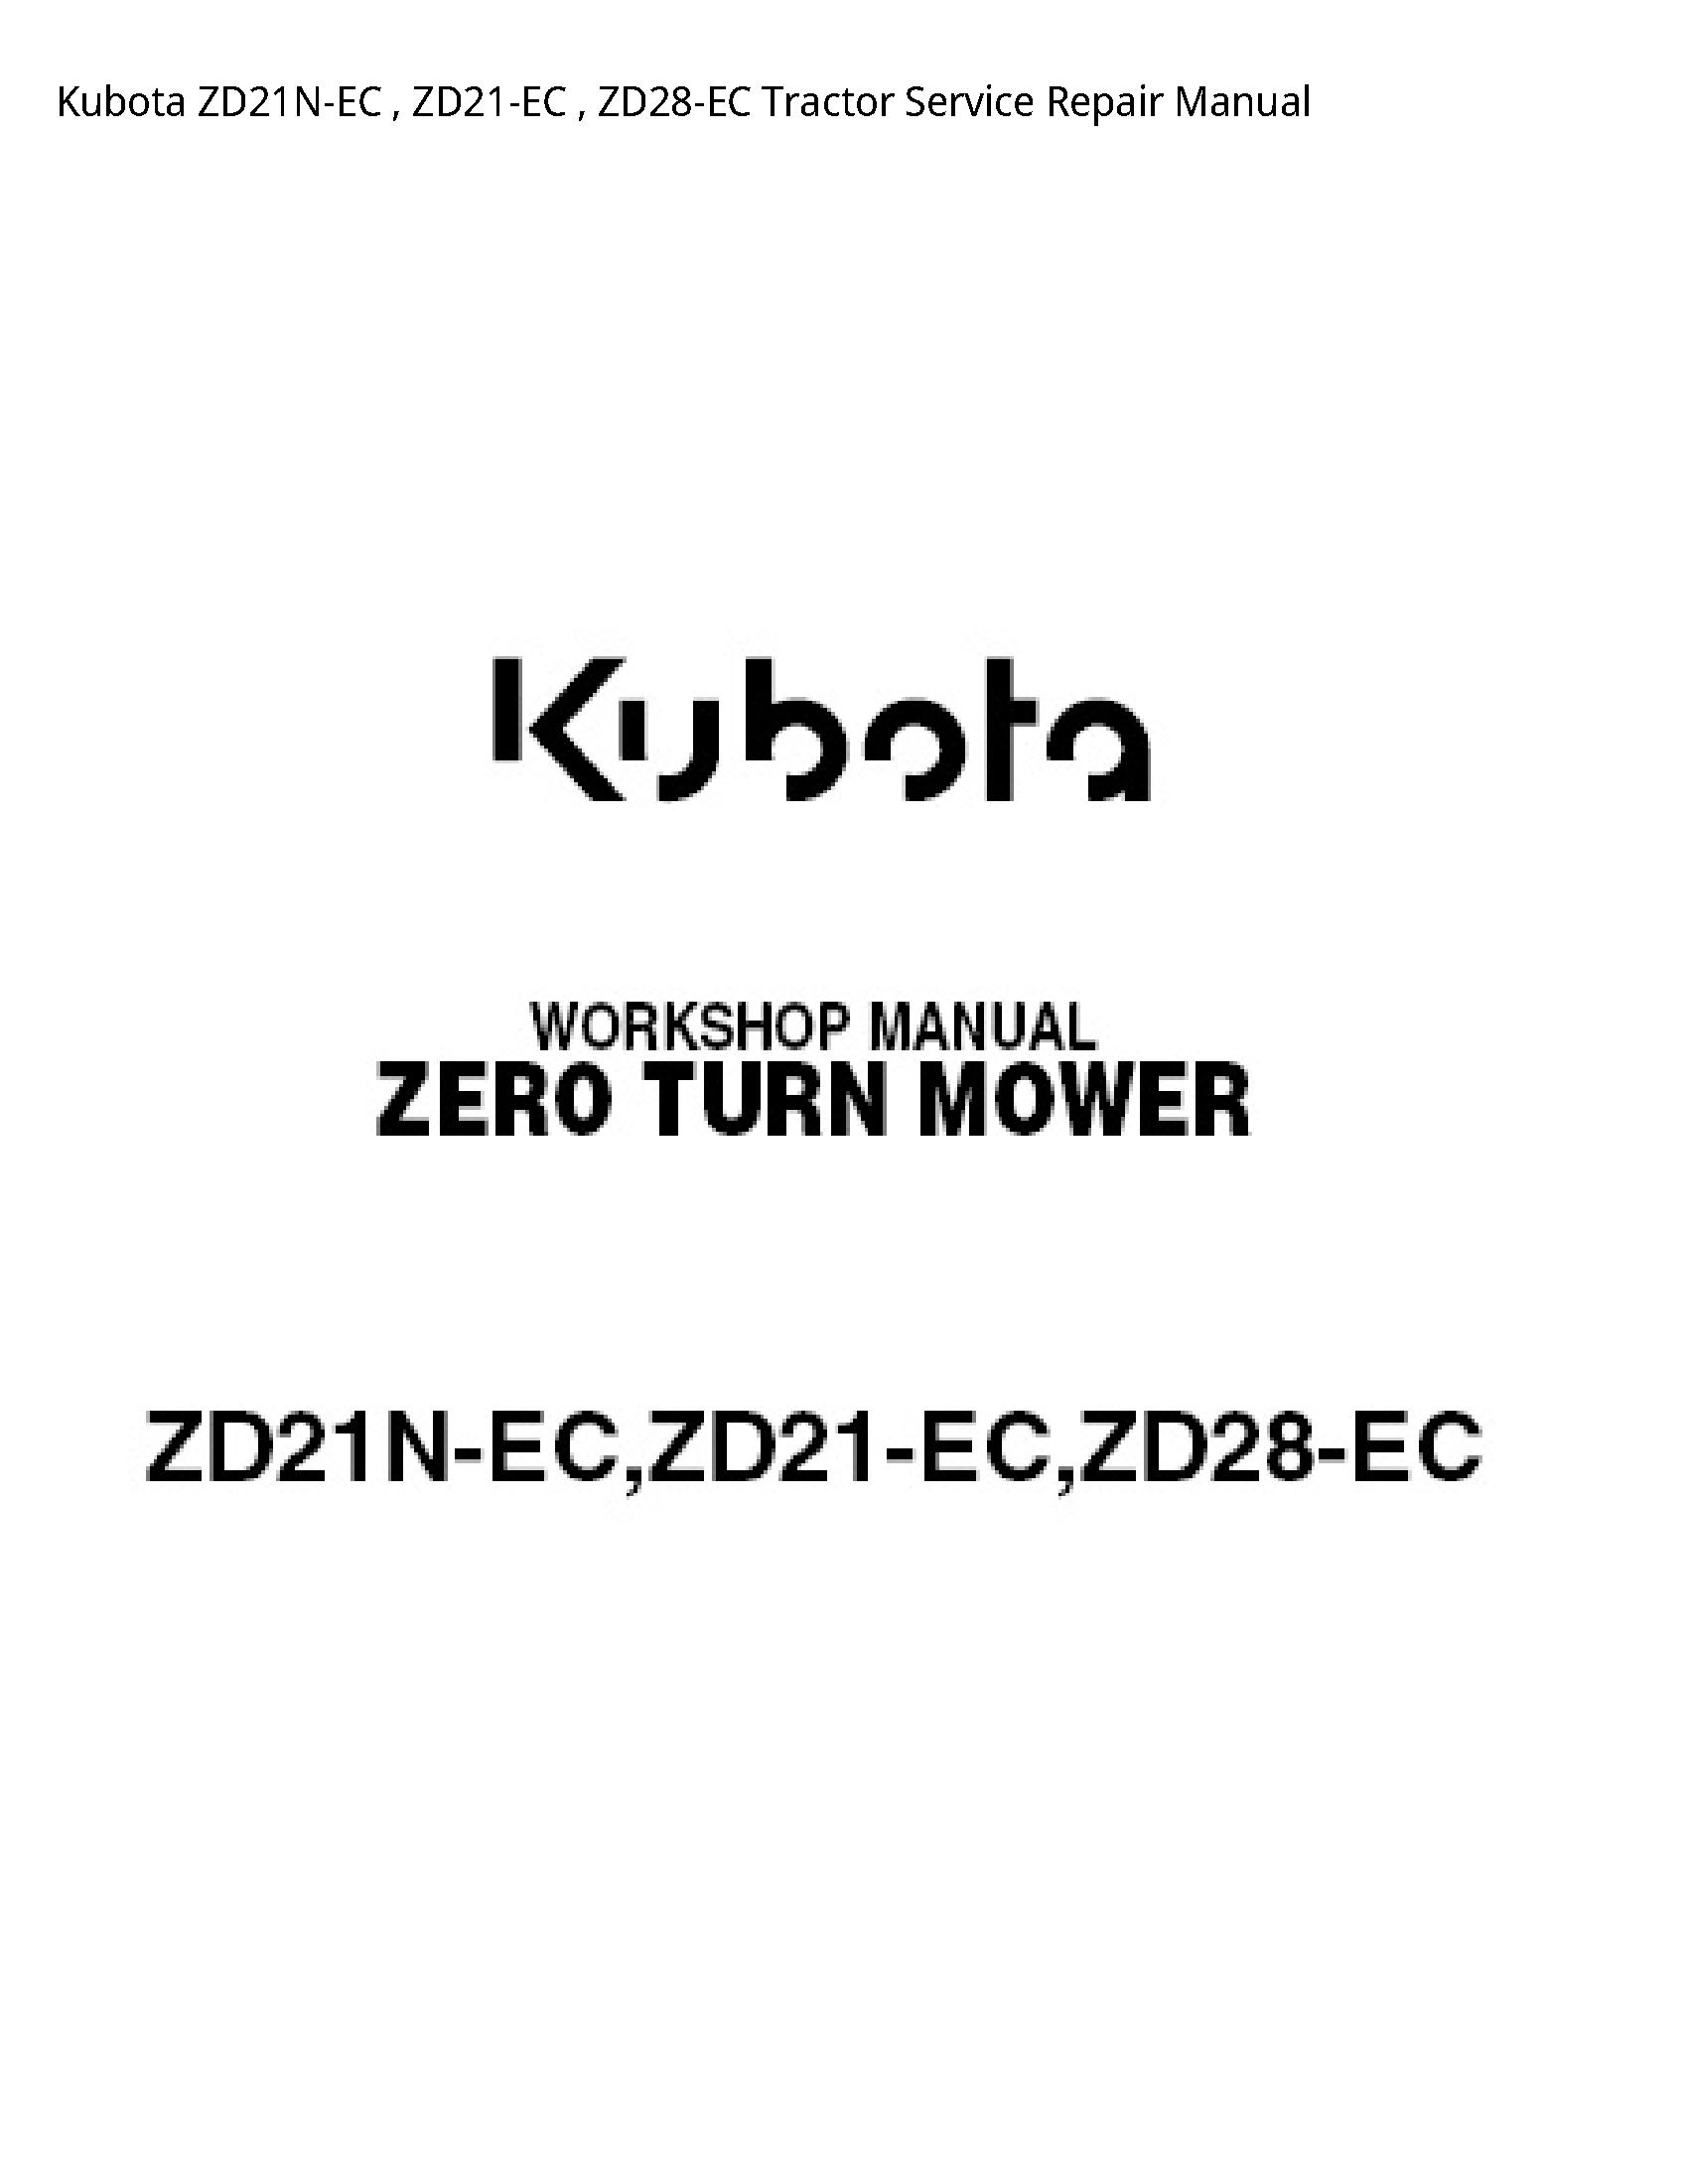 Kubota ZD21N-EC Tractor manual